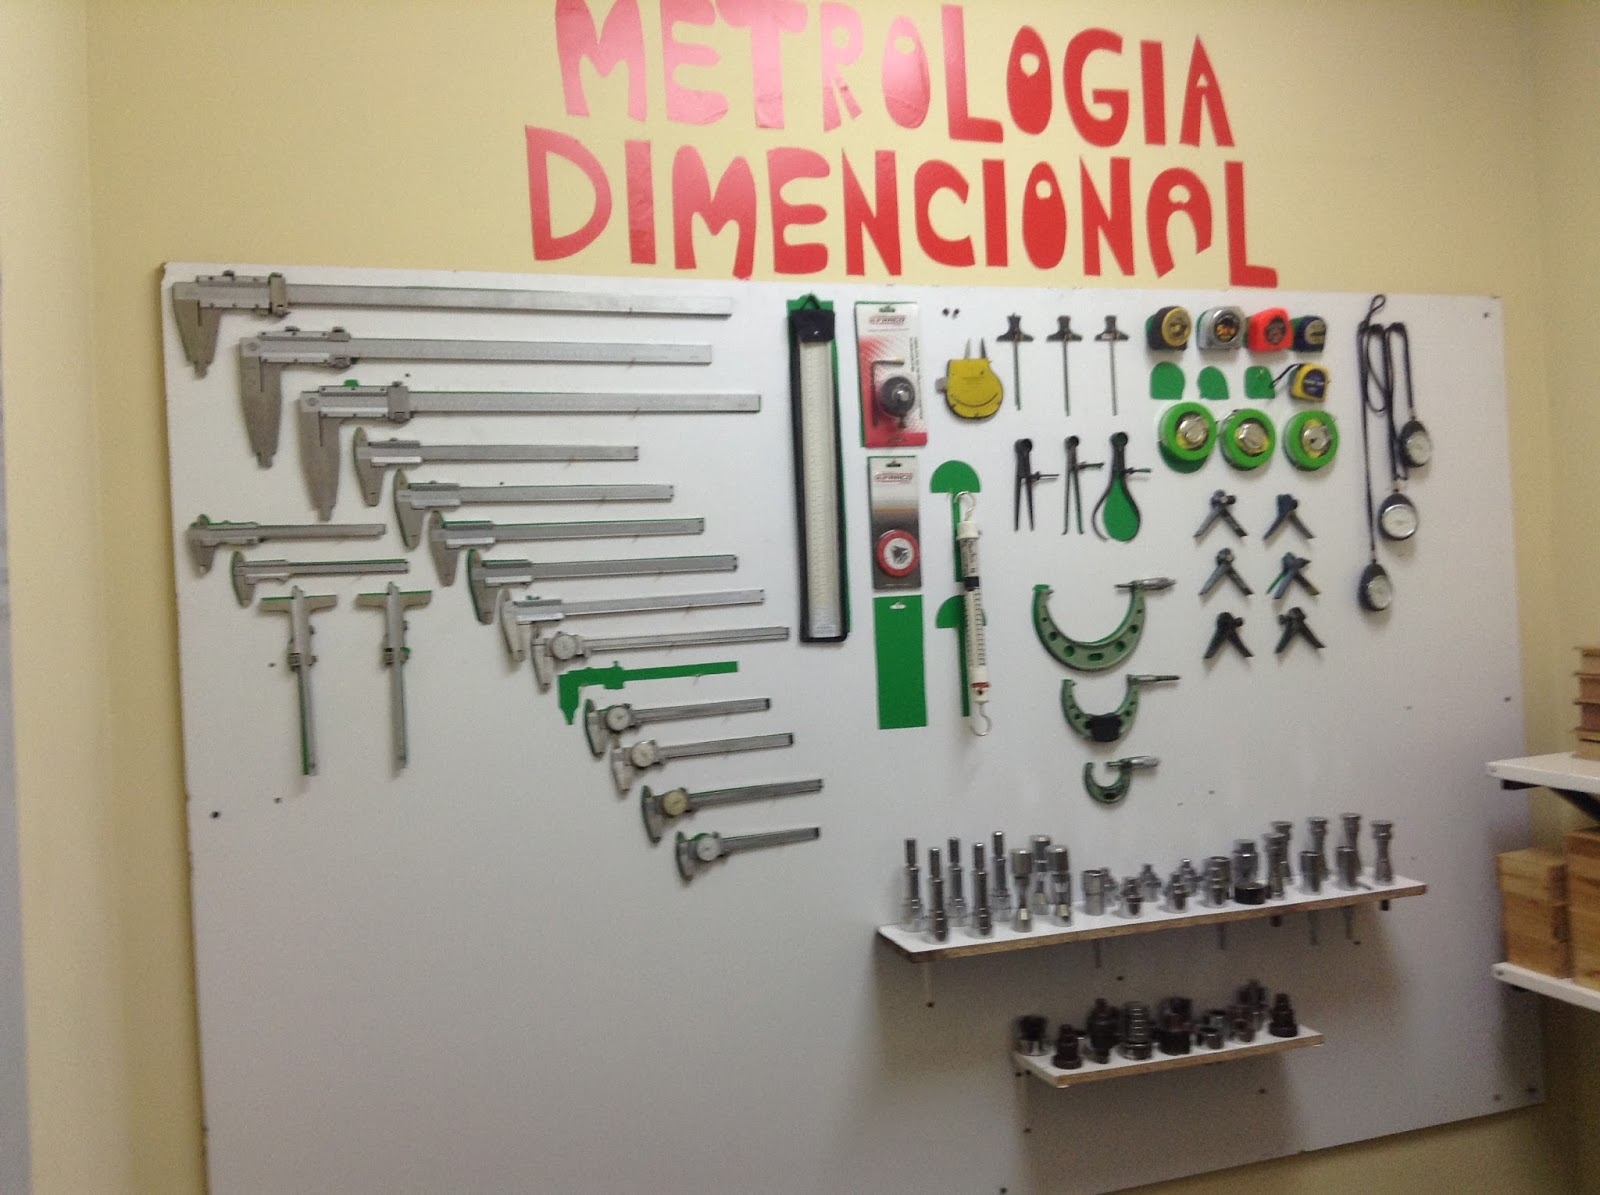 QUE ES METROLOGIA DIMENSIONAL PDF DOWNLOAD